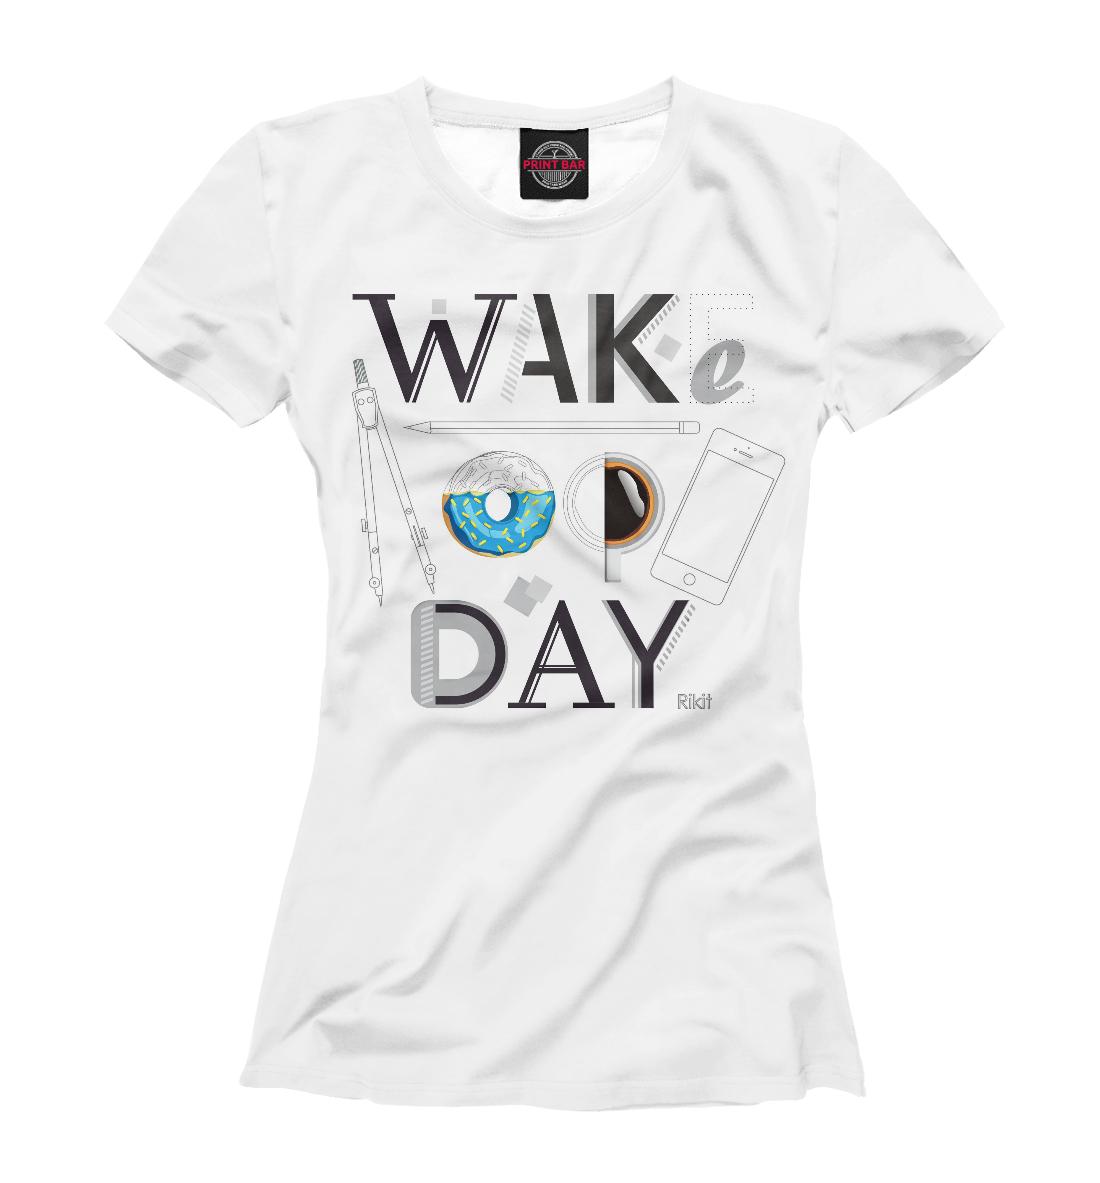 Купить Say wake up day, Printbar